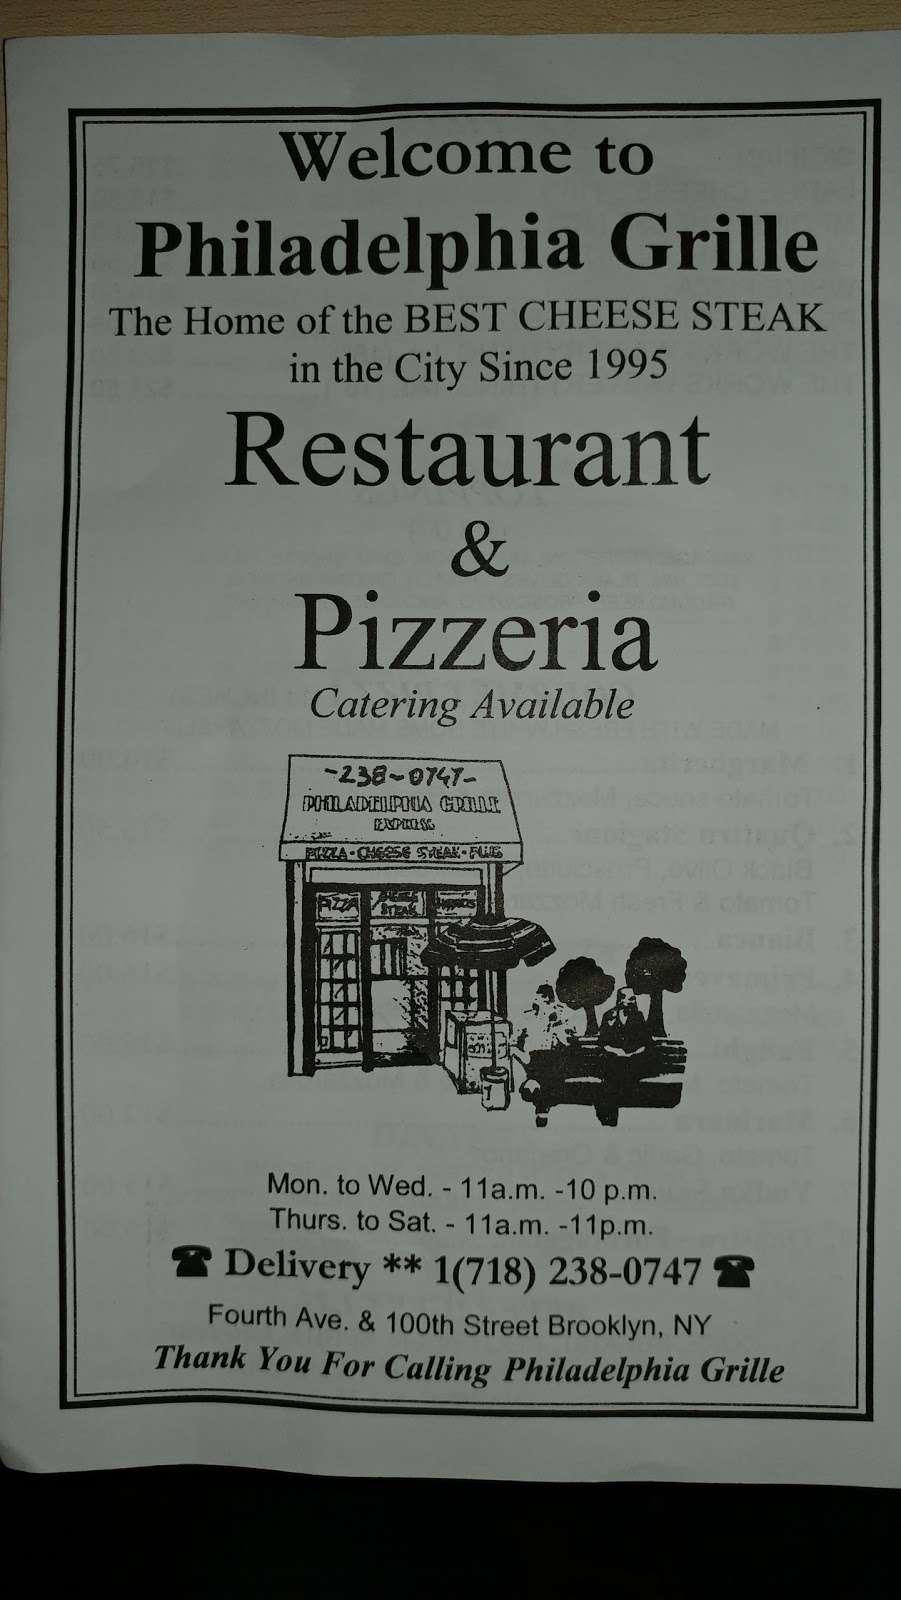 Philadelphia Grille - restaurant  | Photo 3 of 9 | Address: 10004 4th Ave, Brooklyn, NY 11209, USA | Phone: (718) 238-0747